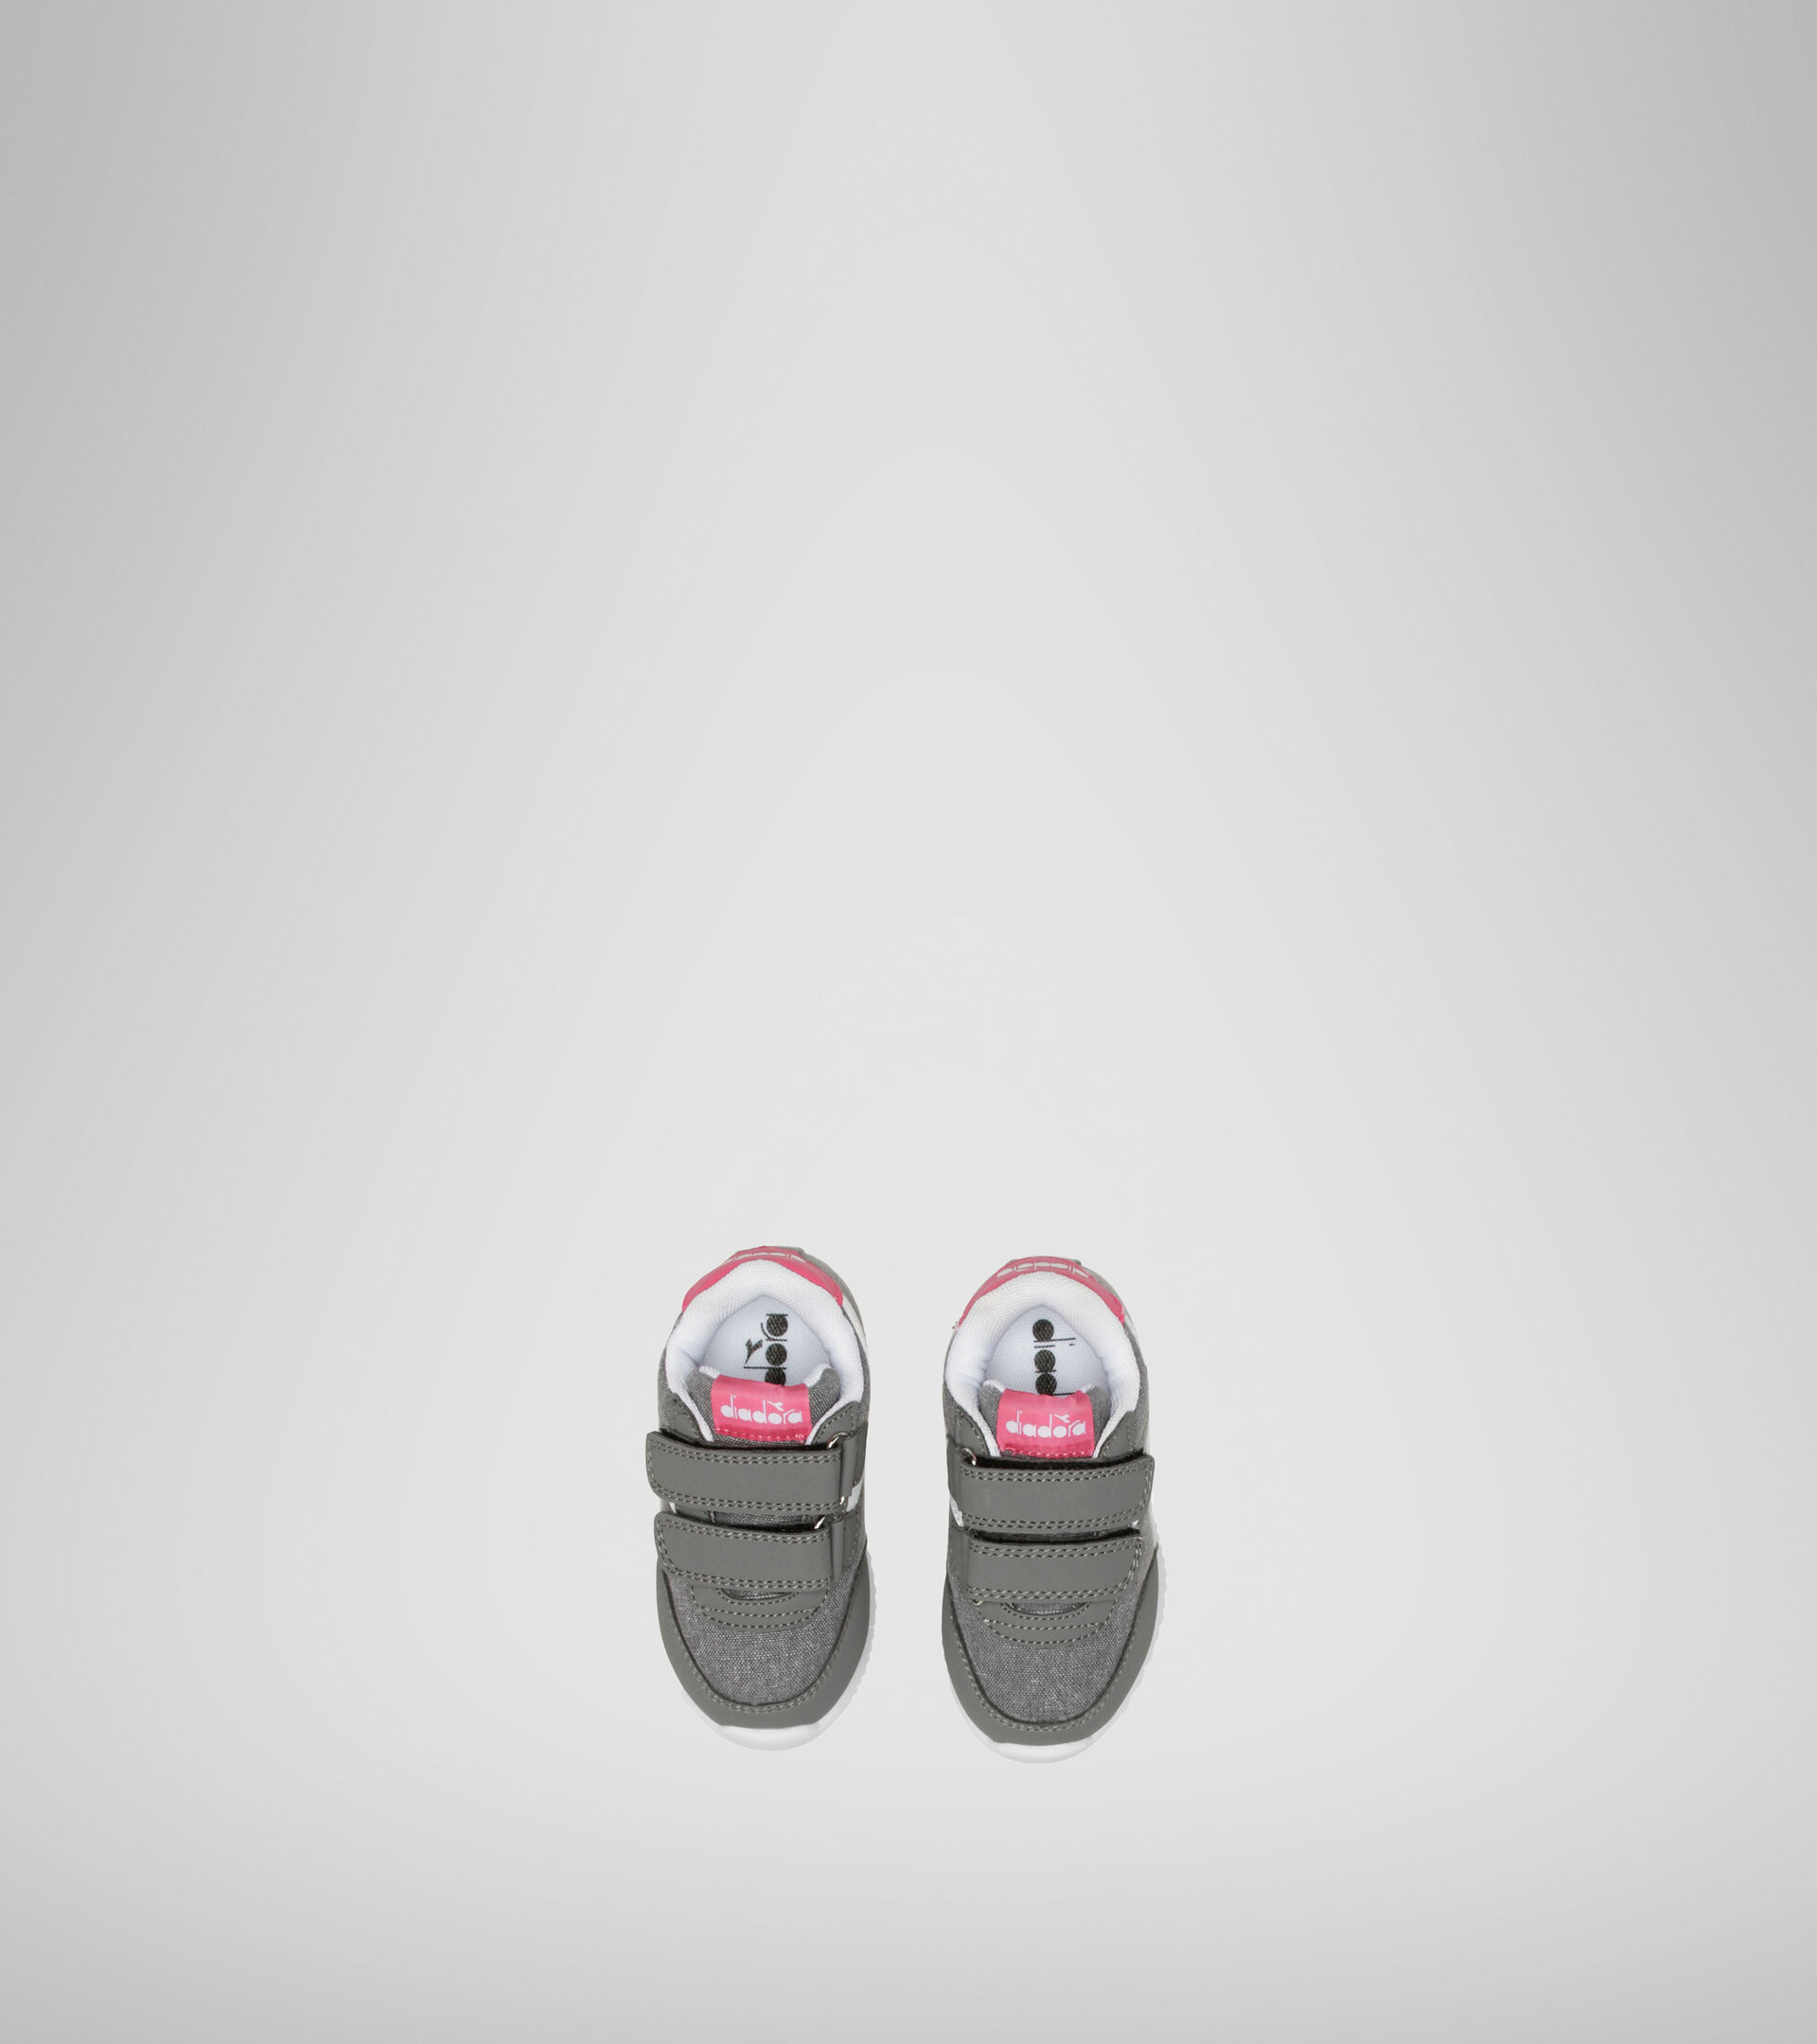 Footwear Sport BAMBINO JOG LIGHT TD CHARCOAL GRAY/FANDANGO PINK Diadora